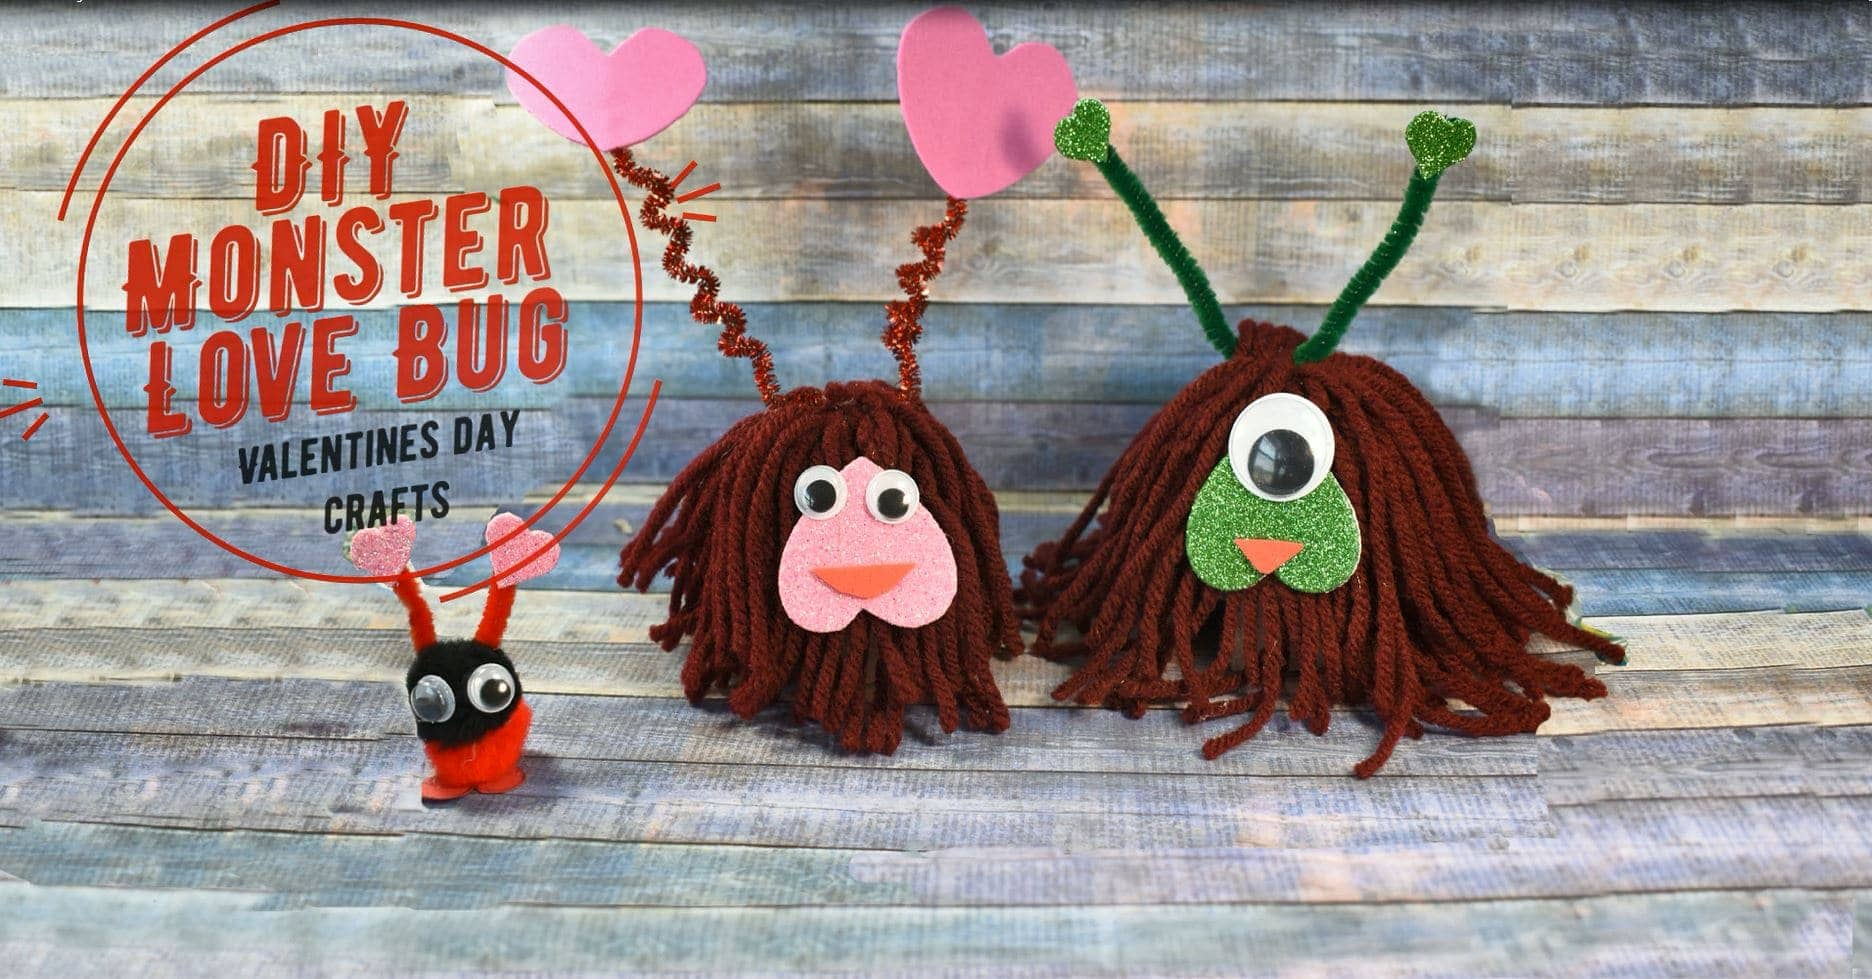 DIY craft for Valentines day